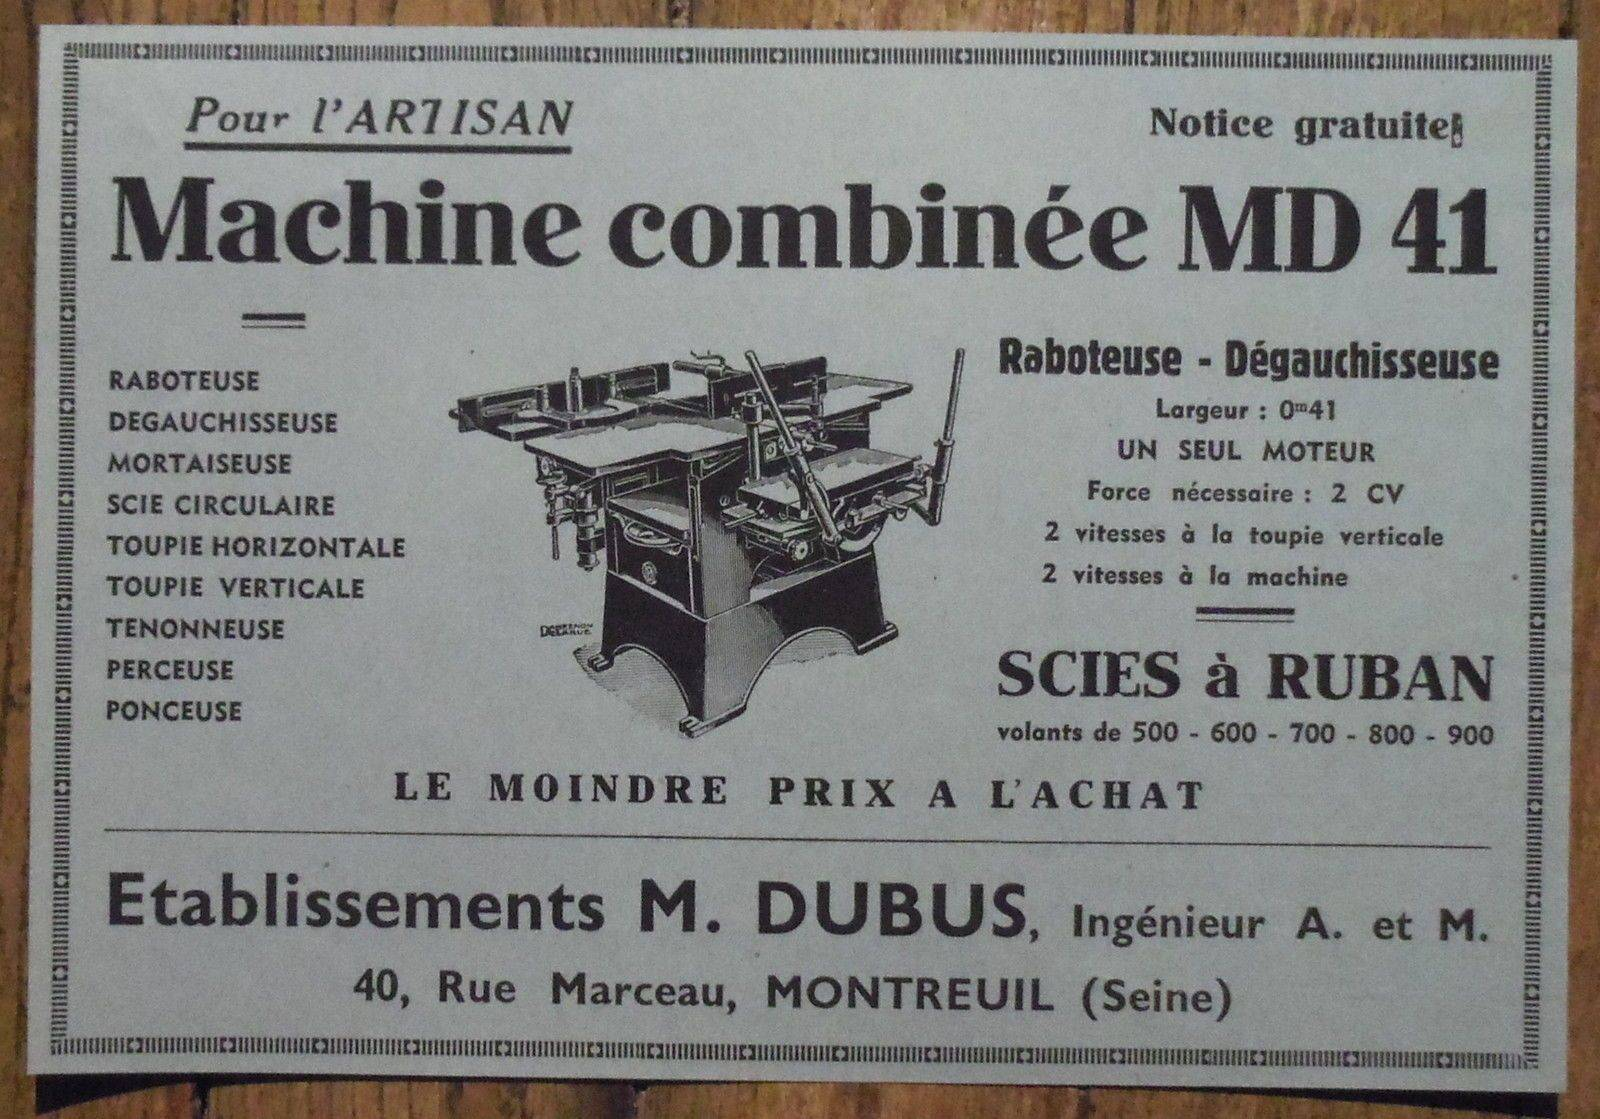 CombinéeDUBUS_MD41.jpg